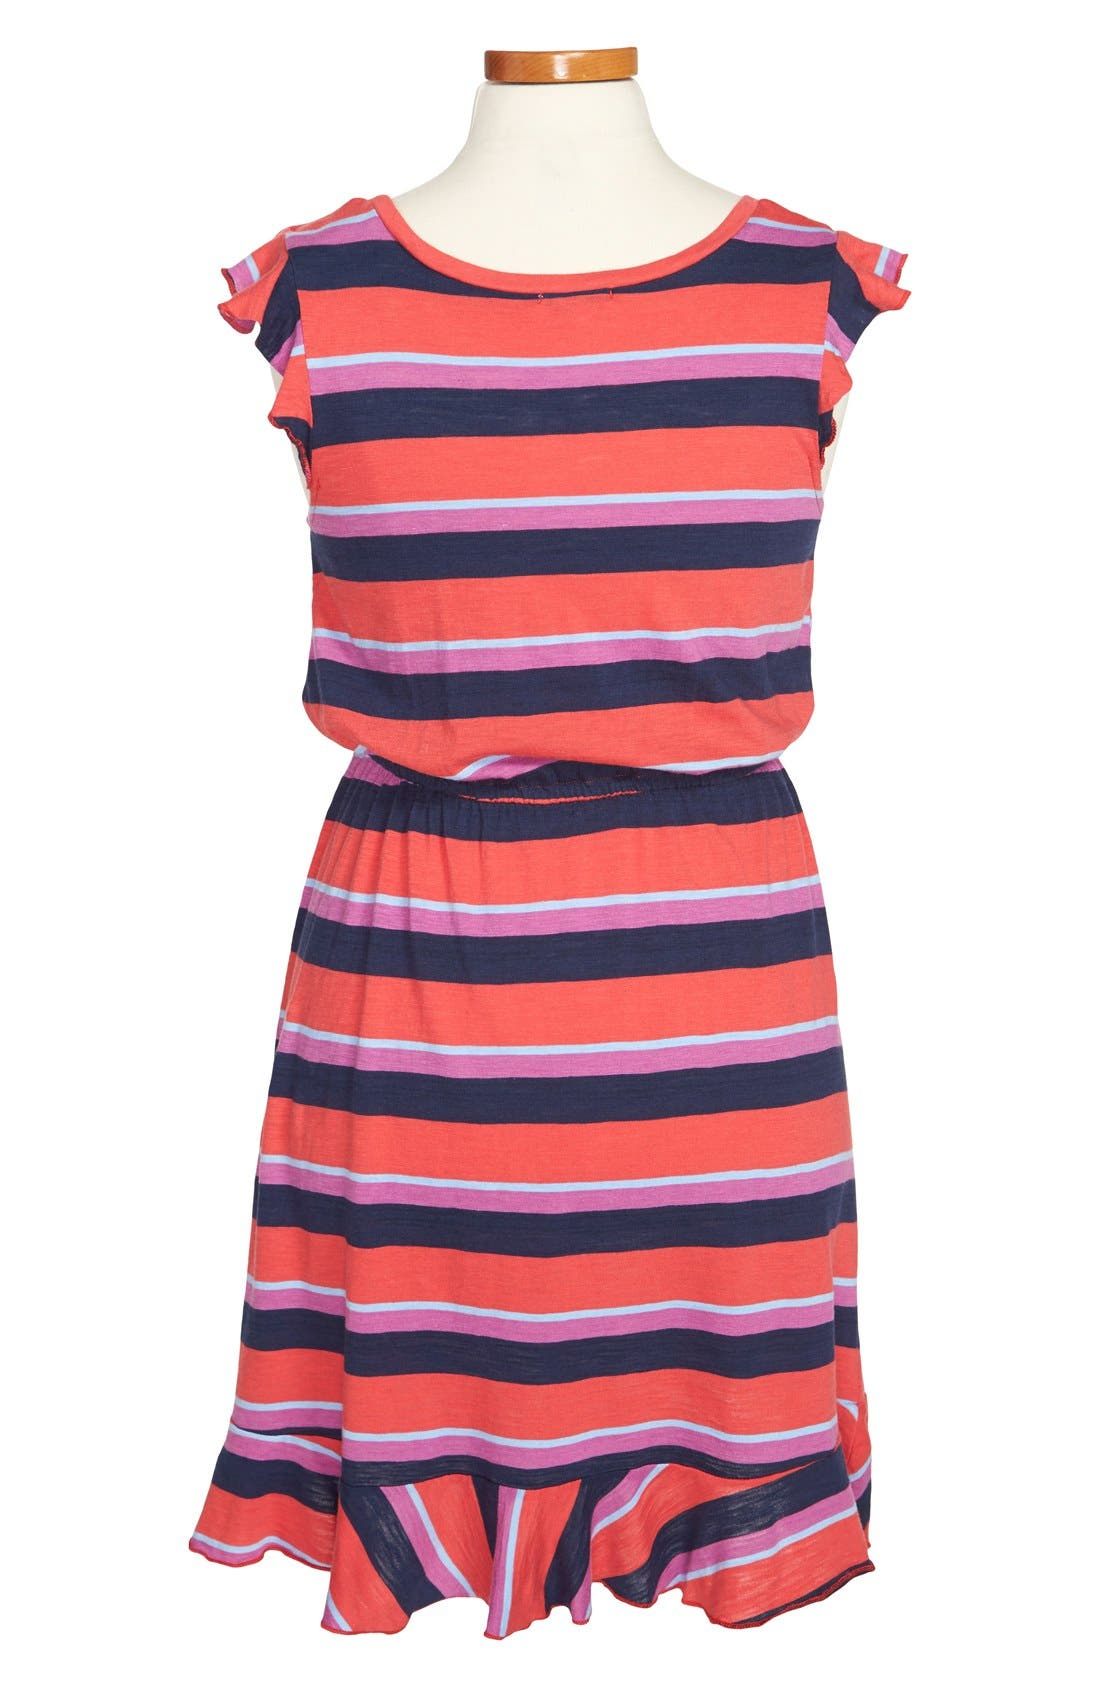 Alternate Image 2  - Splendid 'Wow' Stripe Flutter Sleeve Dress (Big Girls)